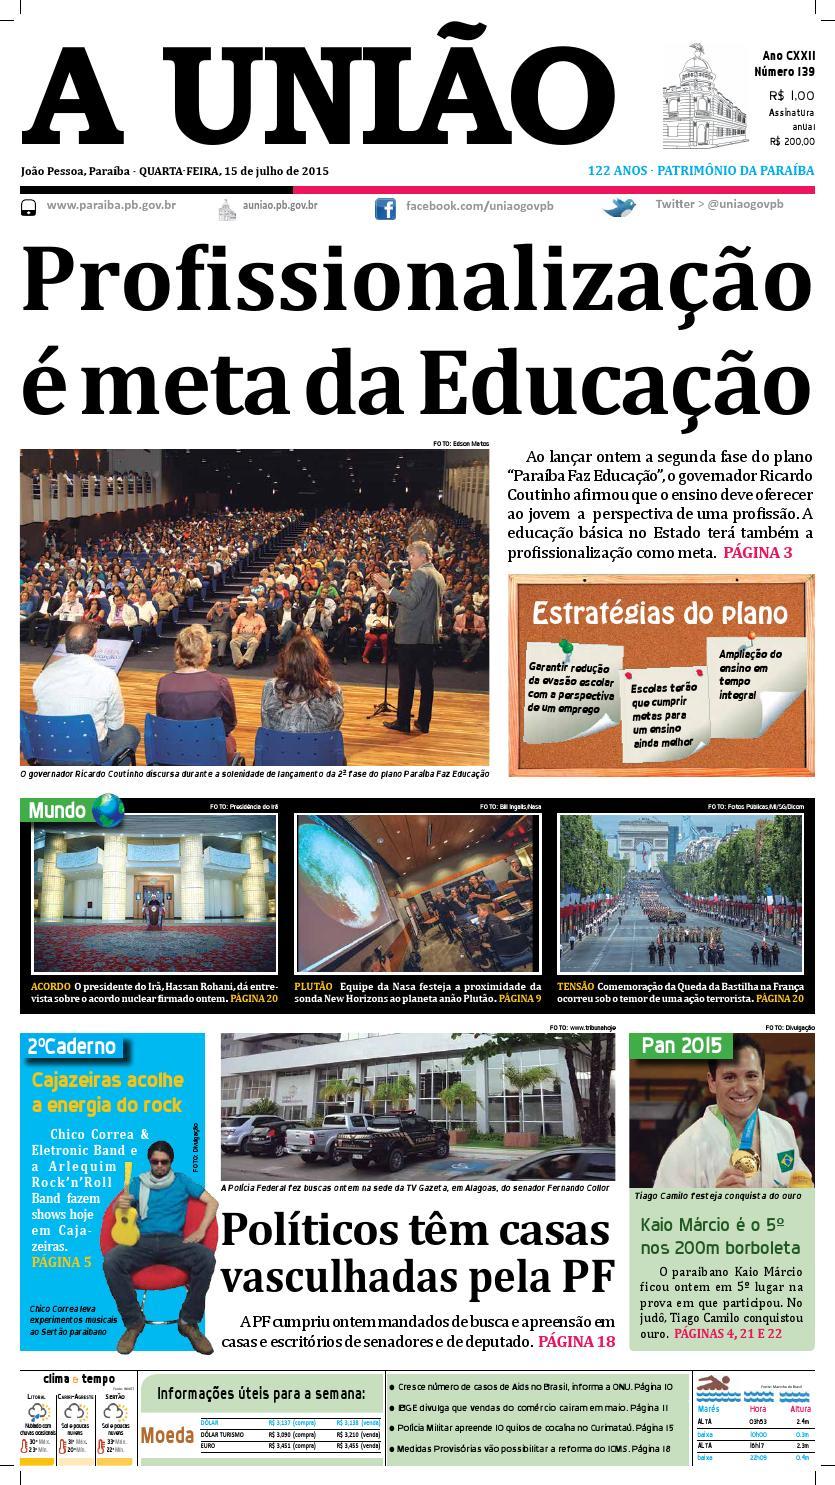 Jornal A União - 15 07 2015 by Jornal A União - issuu 0e7600919ce1b